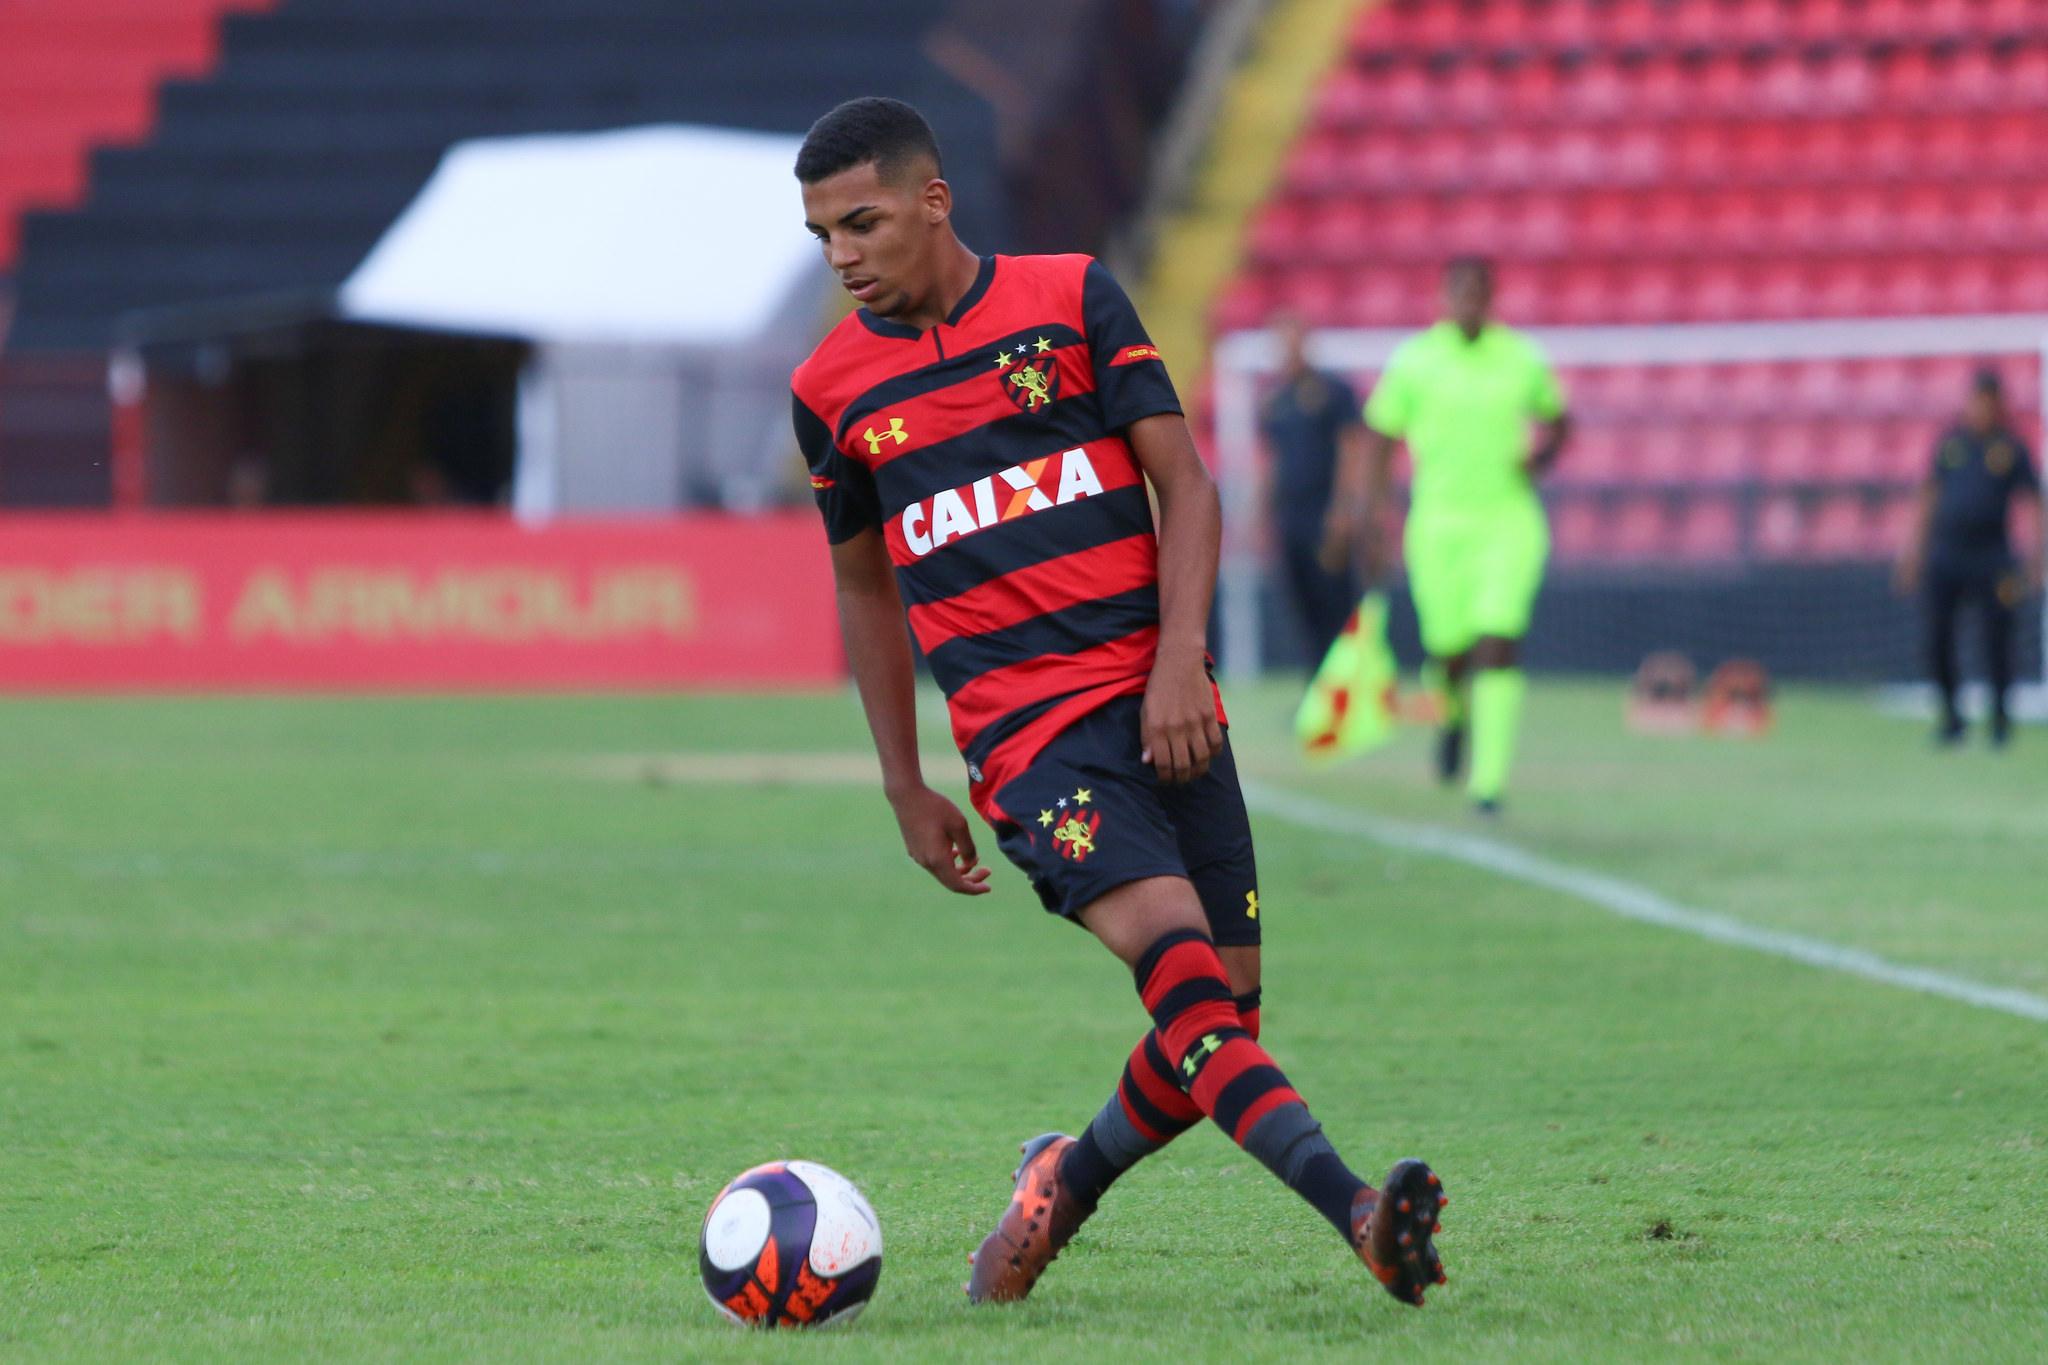 Sport vence Paraná e garante vaga na 2ª fase da Copa Votorantim